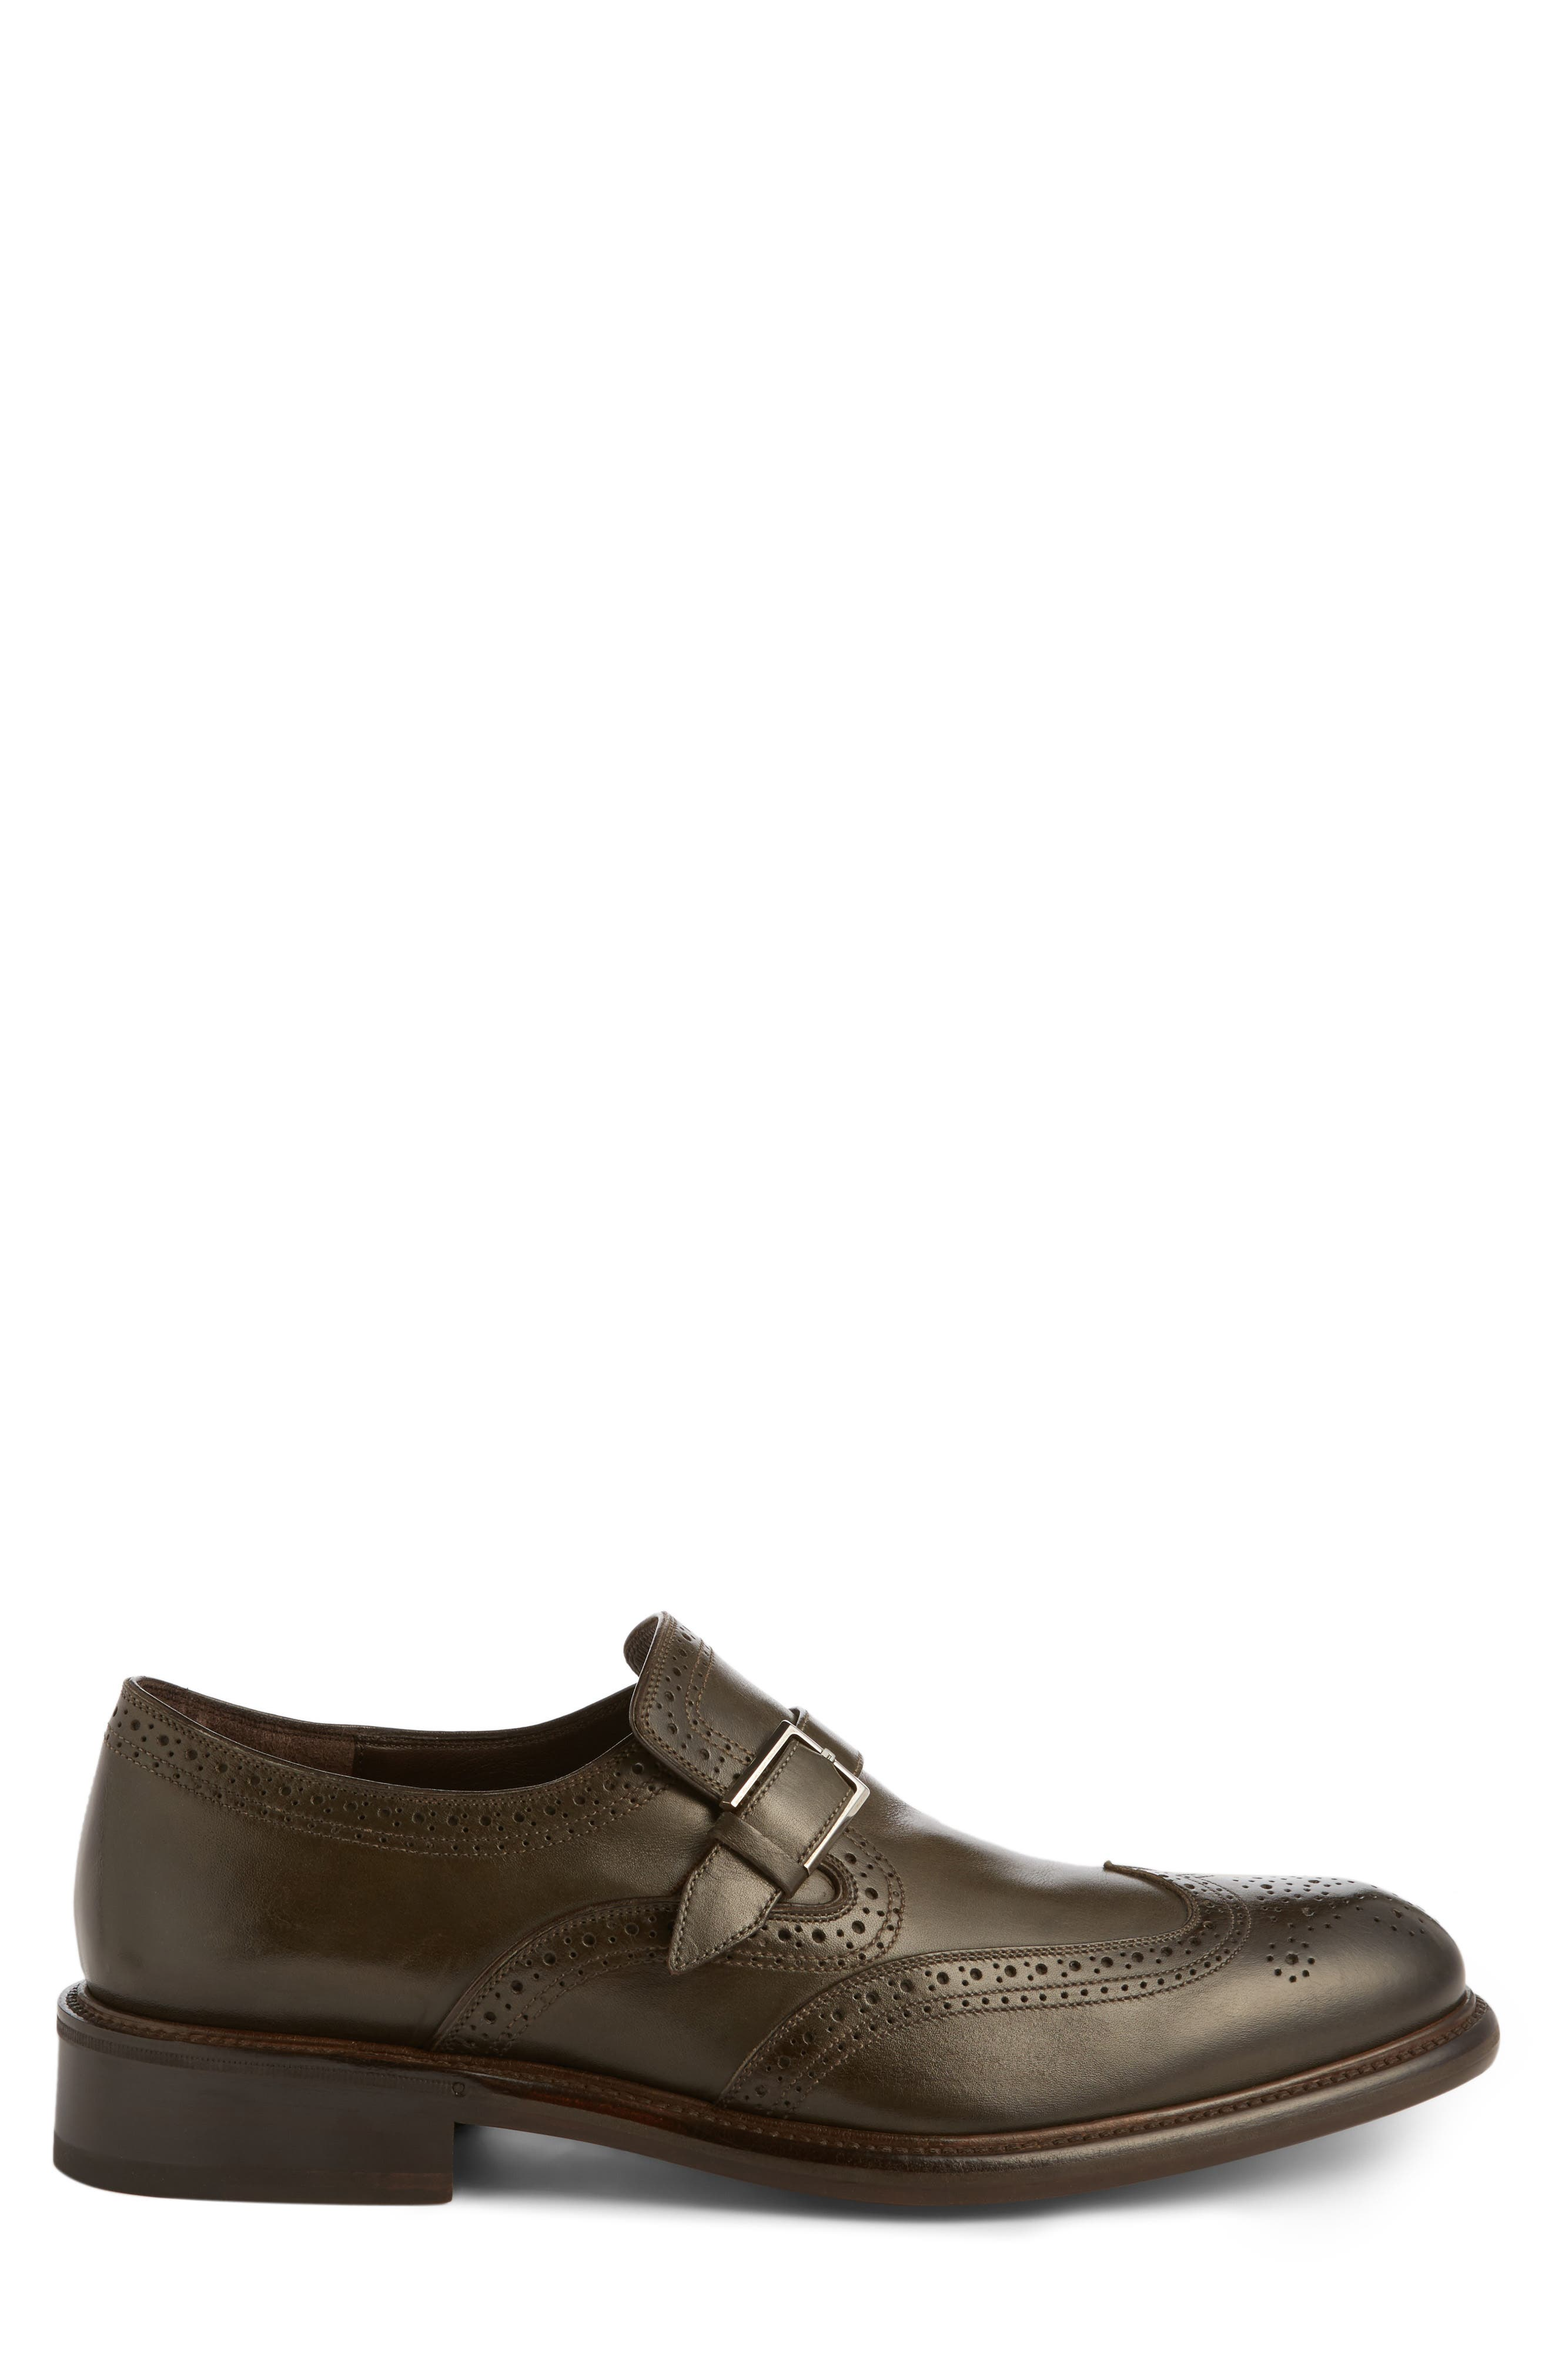 Alternate Image 3  - Salvatore Ferragamo Monk Strap Shoe (Men)